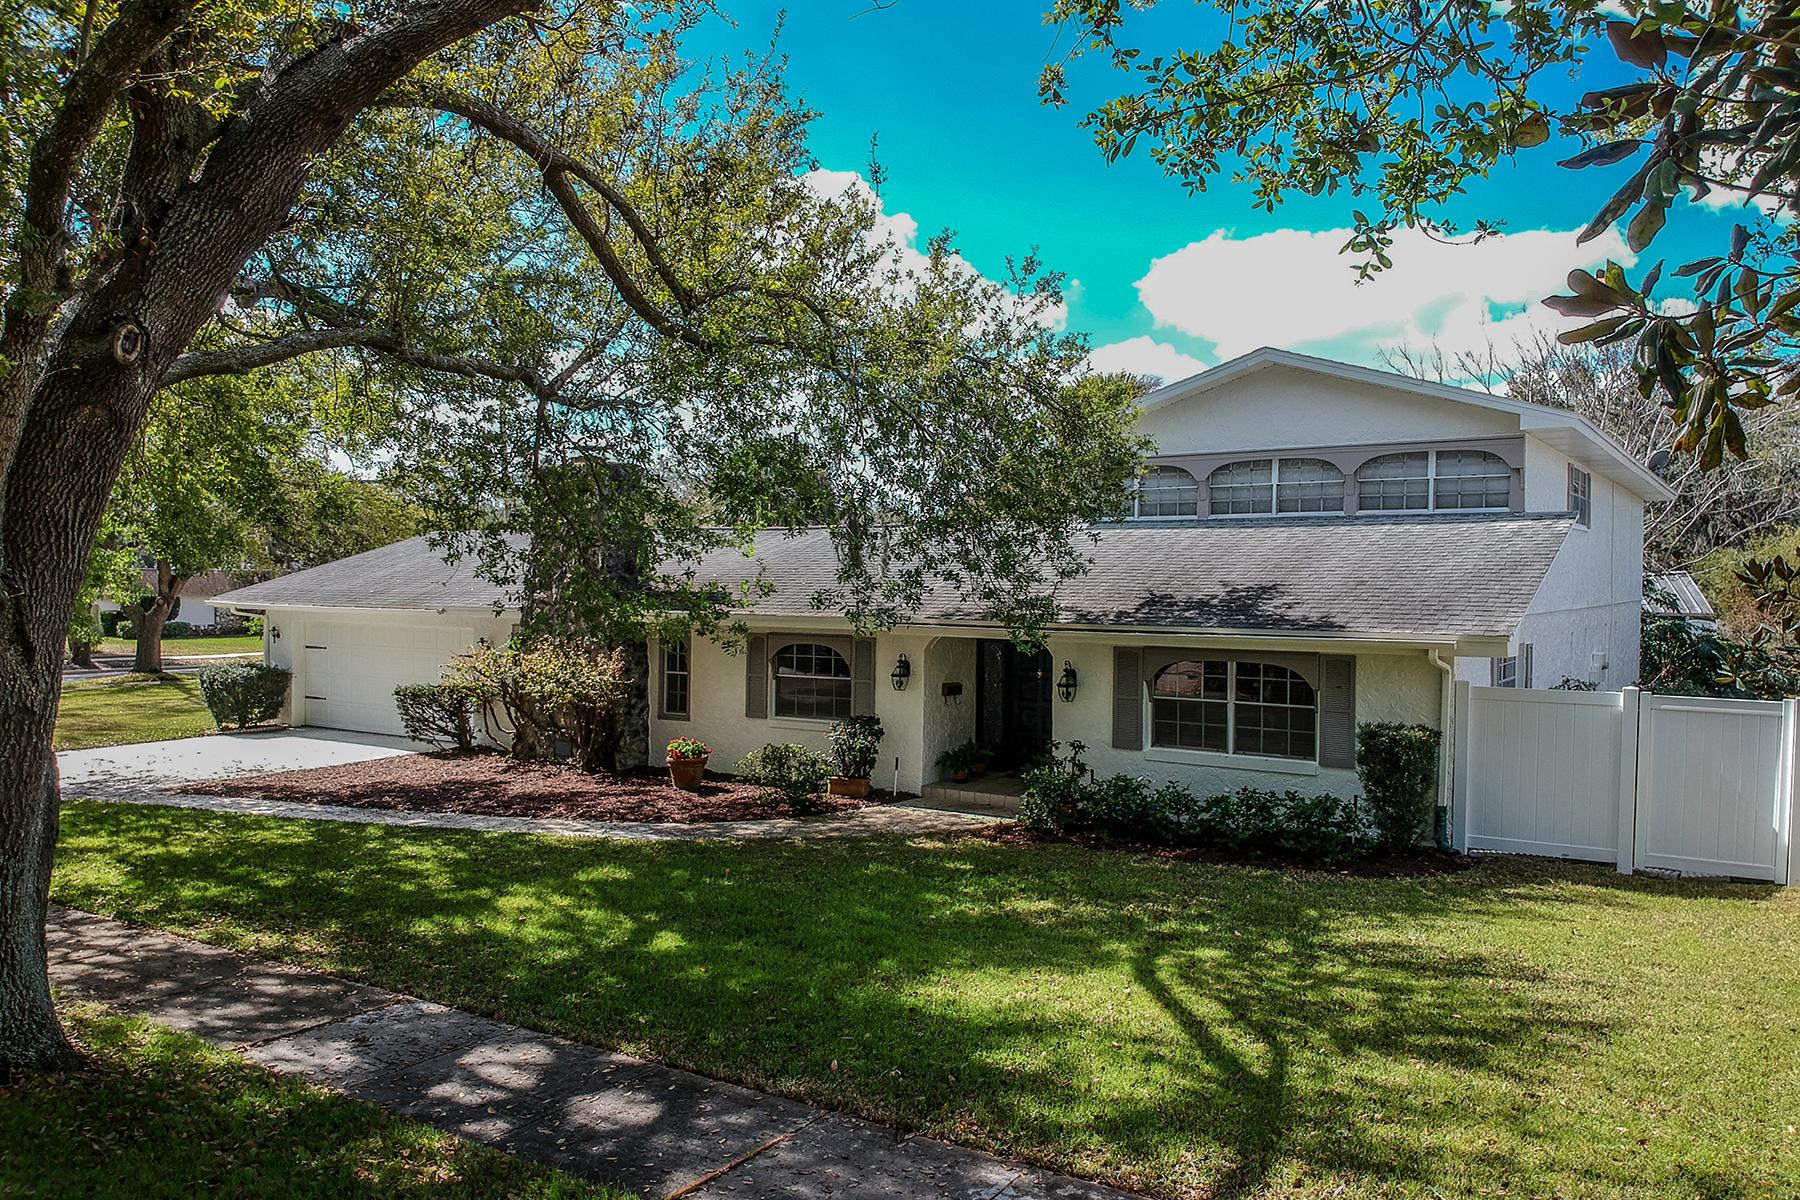 Single Family Home for Sale at Maitland 121 Mariner Way Maitland, Florida 32751 United States